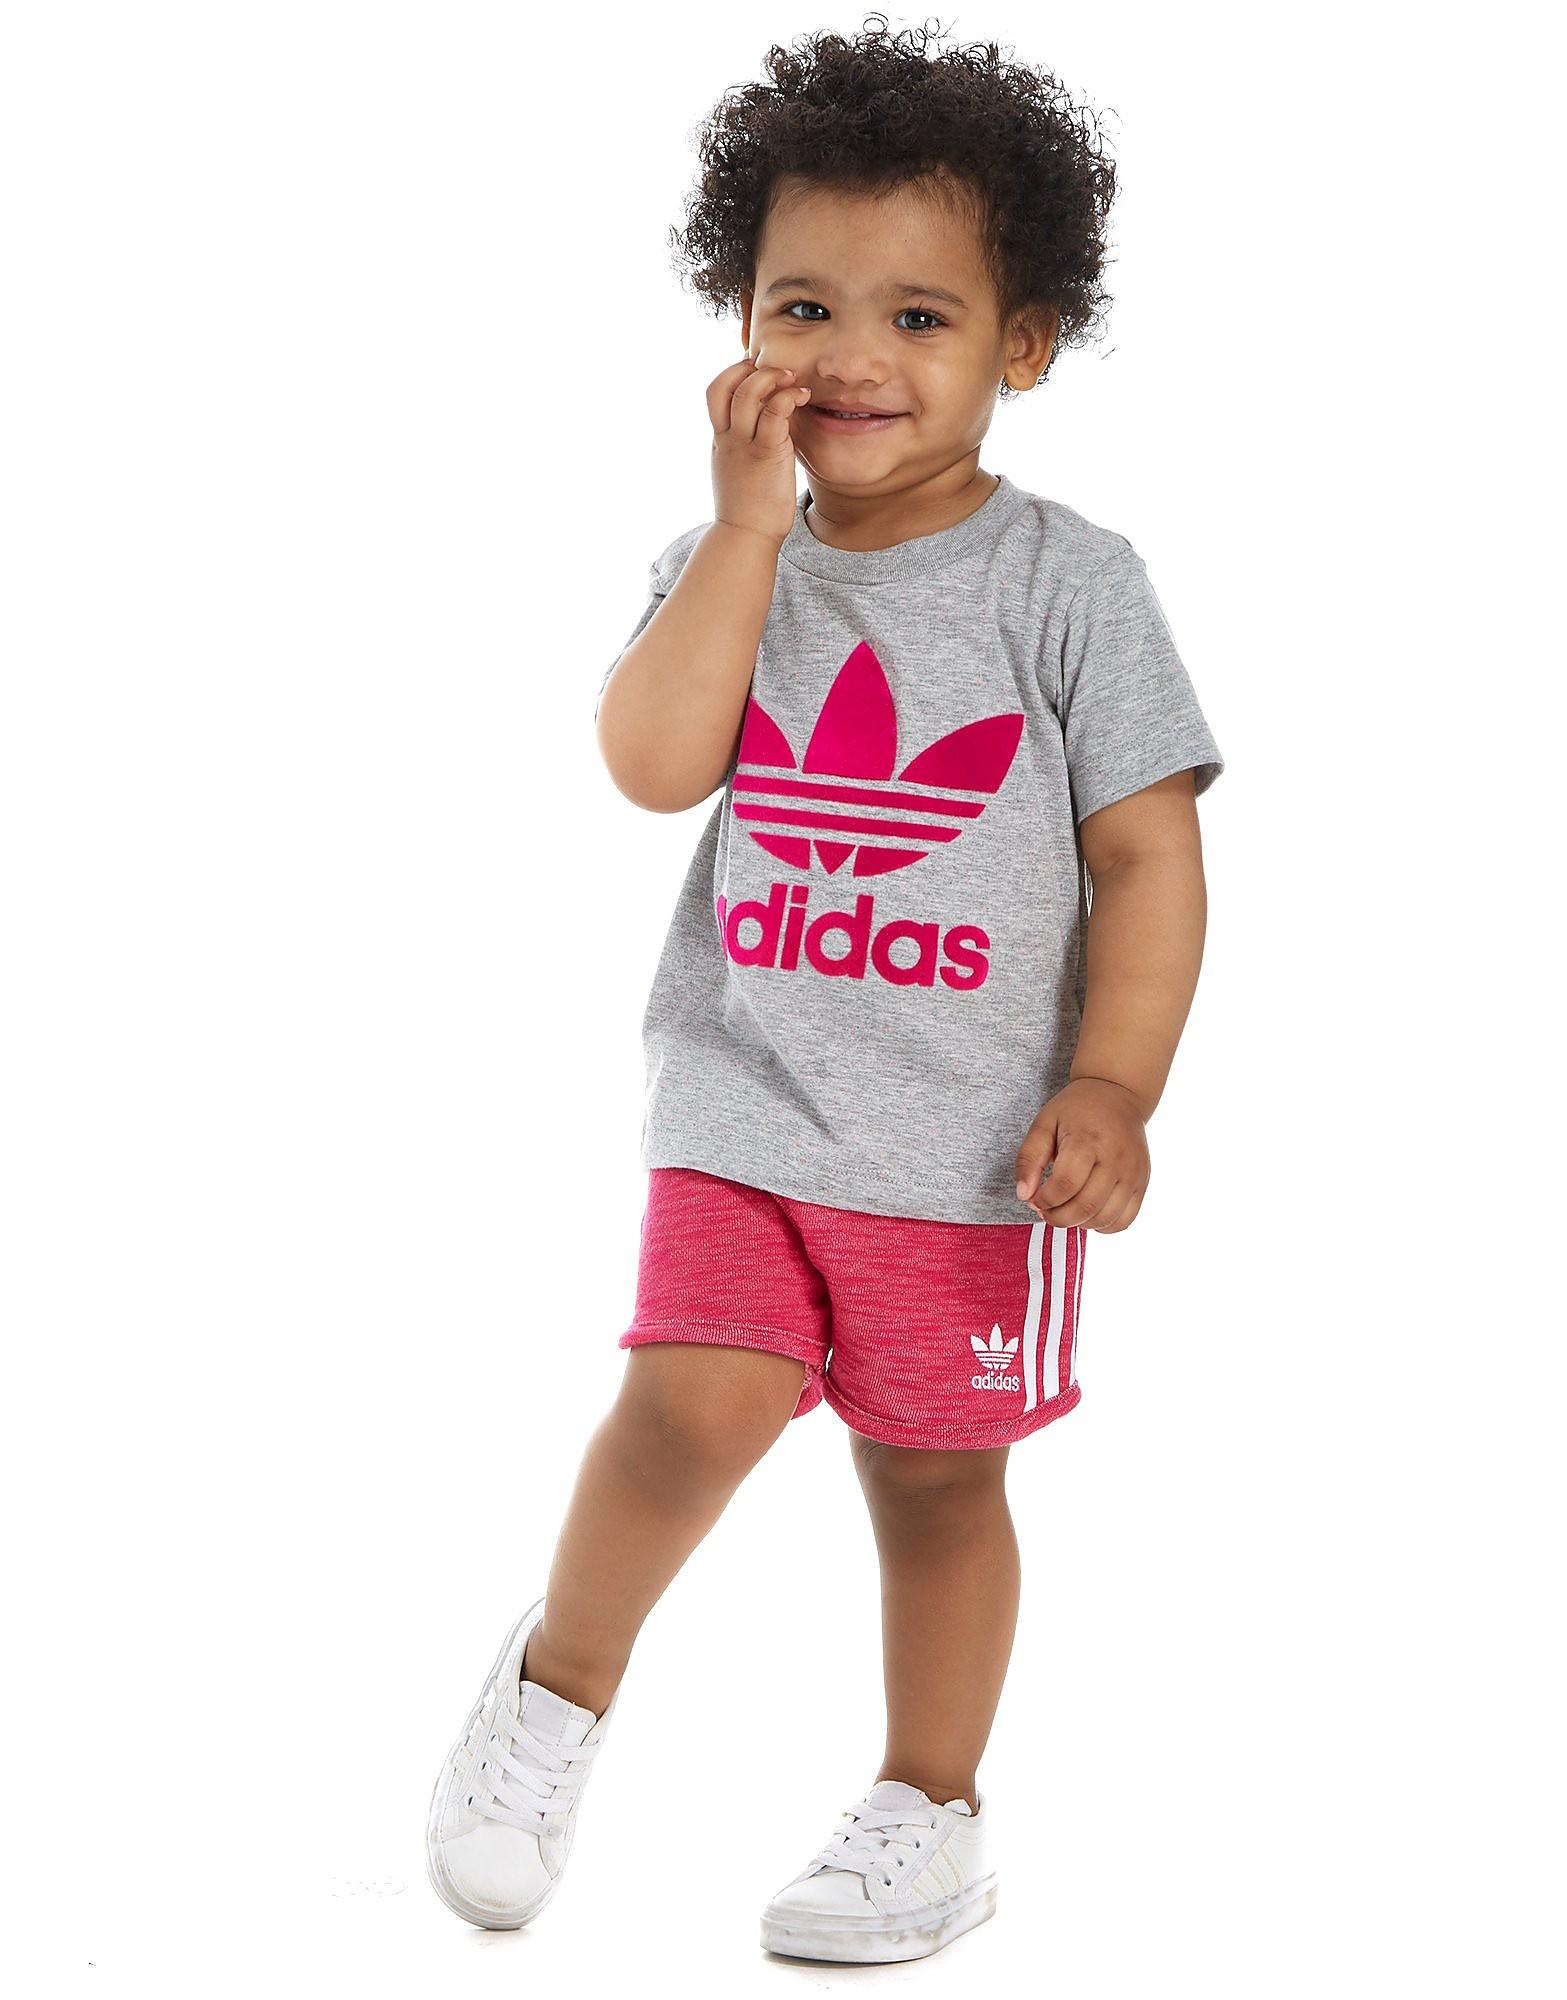 adidas Originals Girls' T-Shirt and Shorts Set Infant - Grey/Pink, Grey/Pink